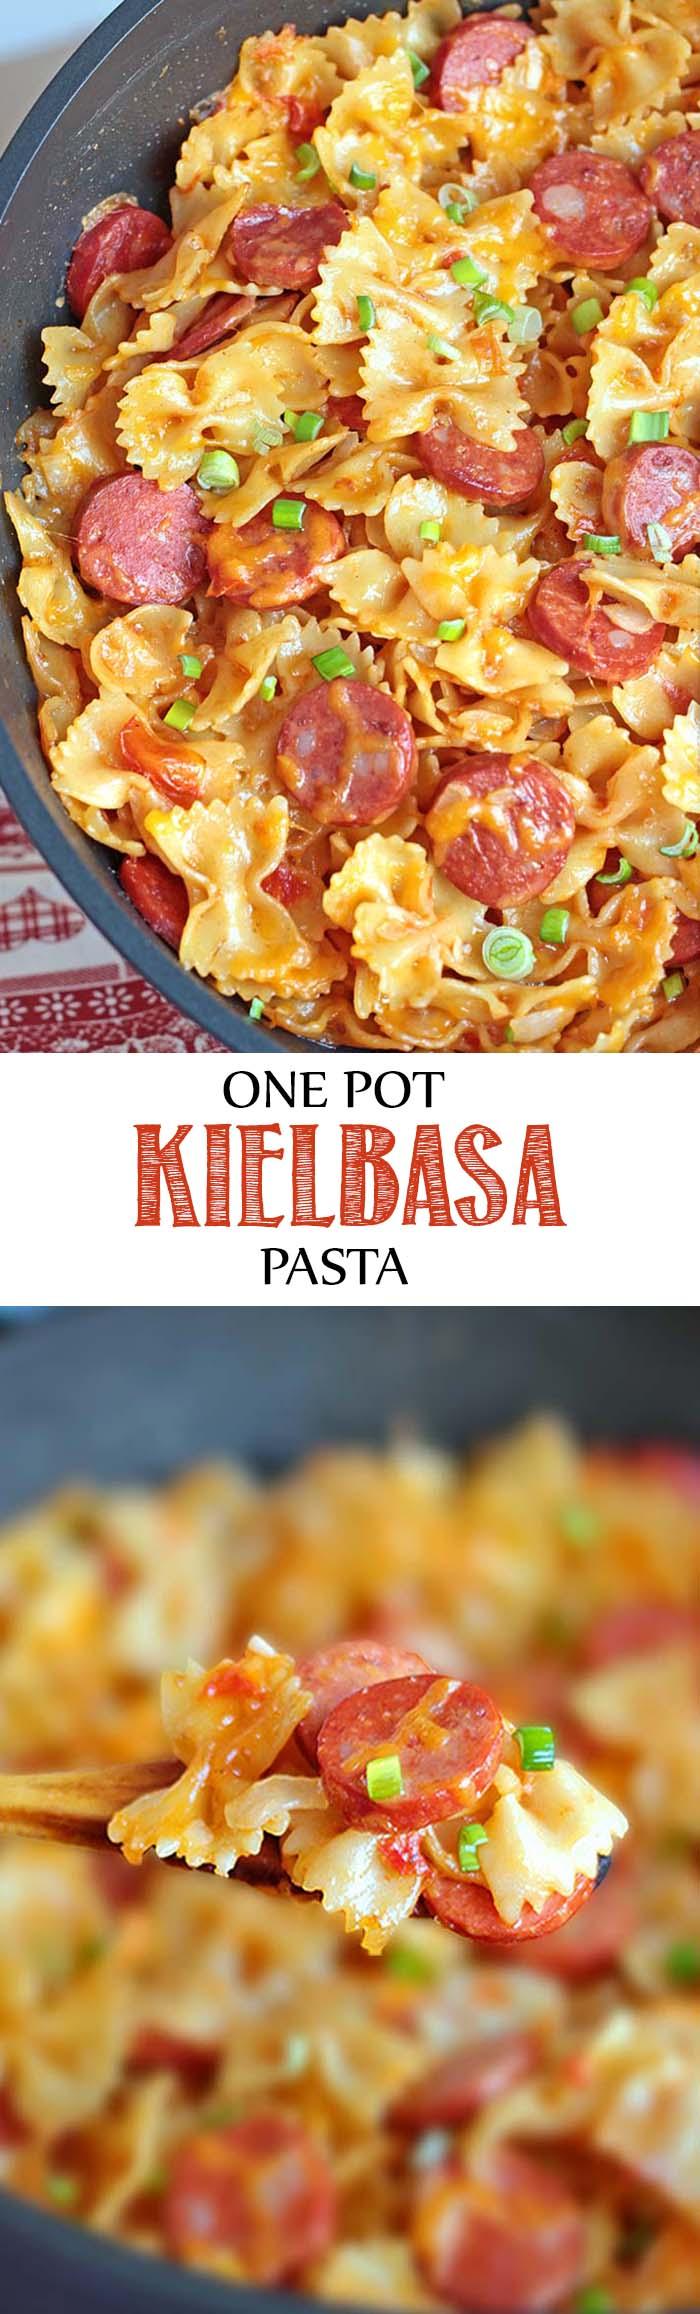 It's a cheesy pasta dish with Kielbasa sausage and garnished with chopped scallions. Enjoy! #pasta #onepot #kielbasa #dinner